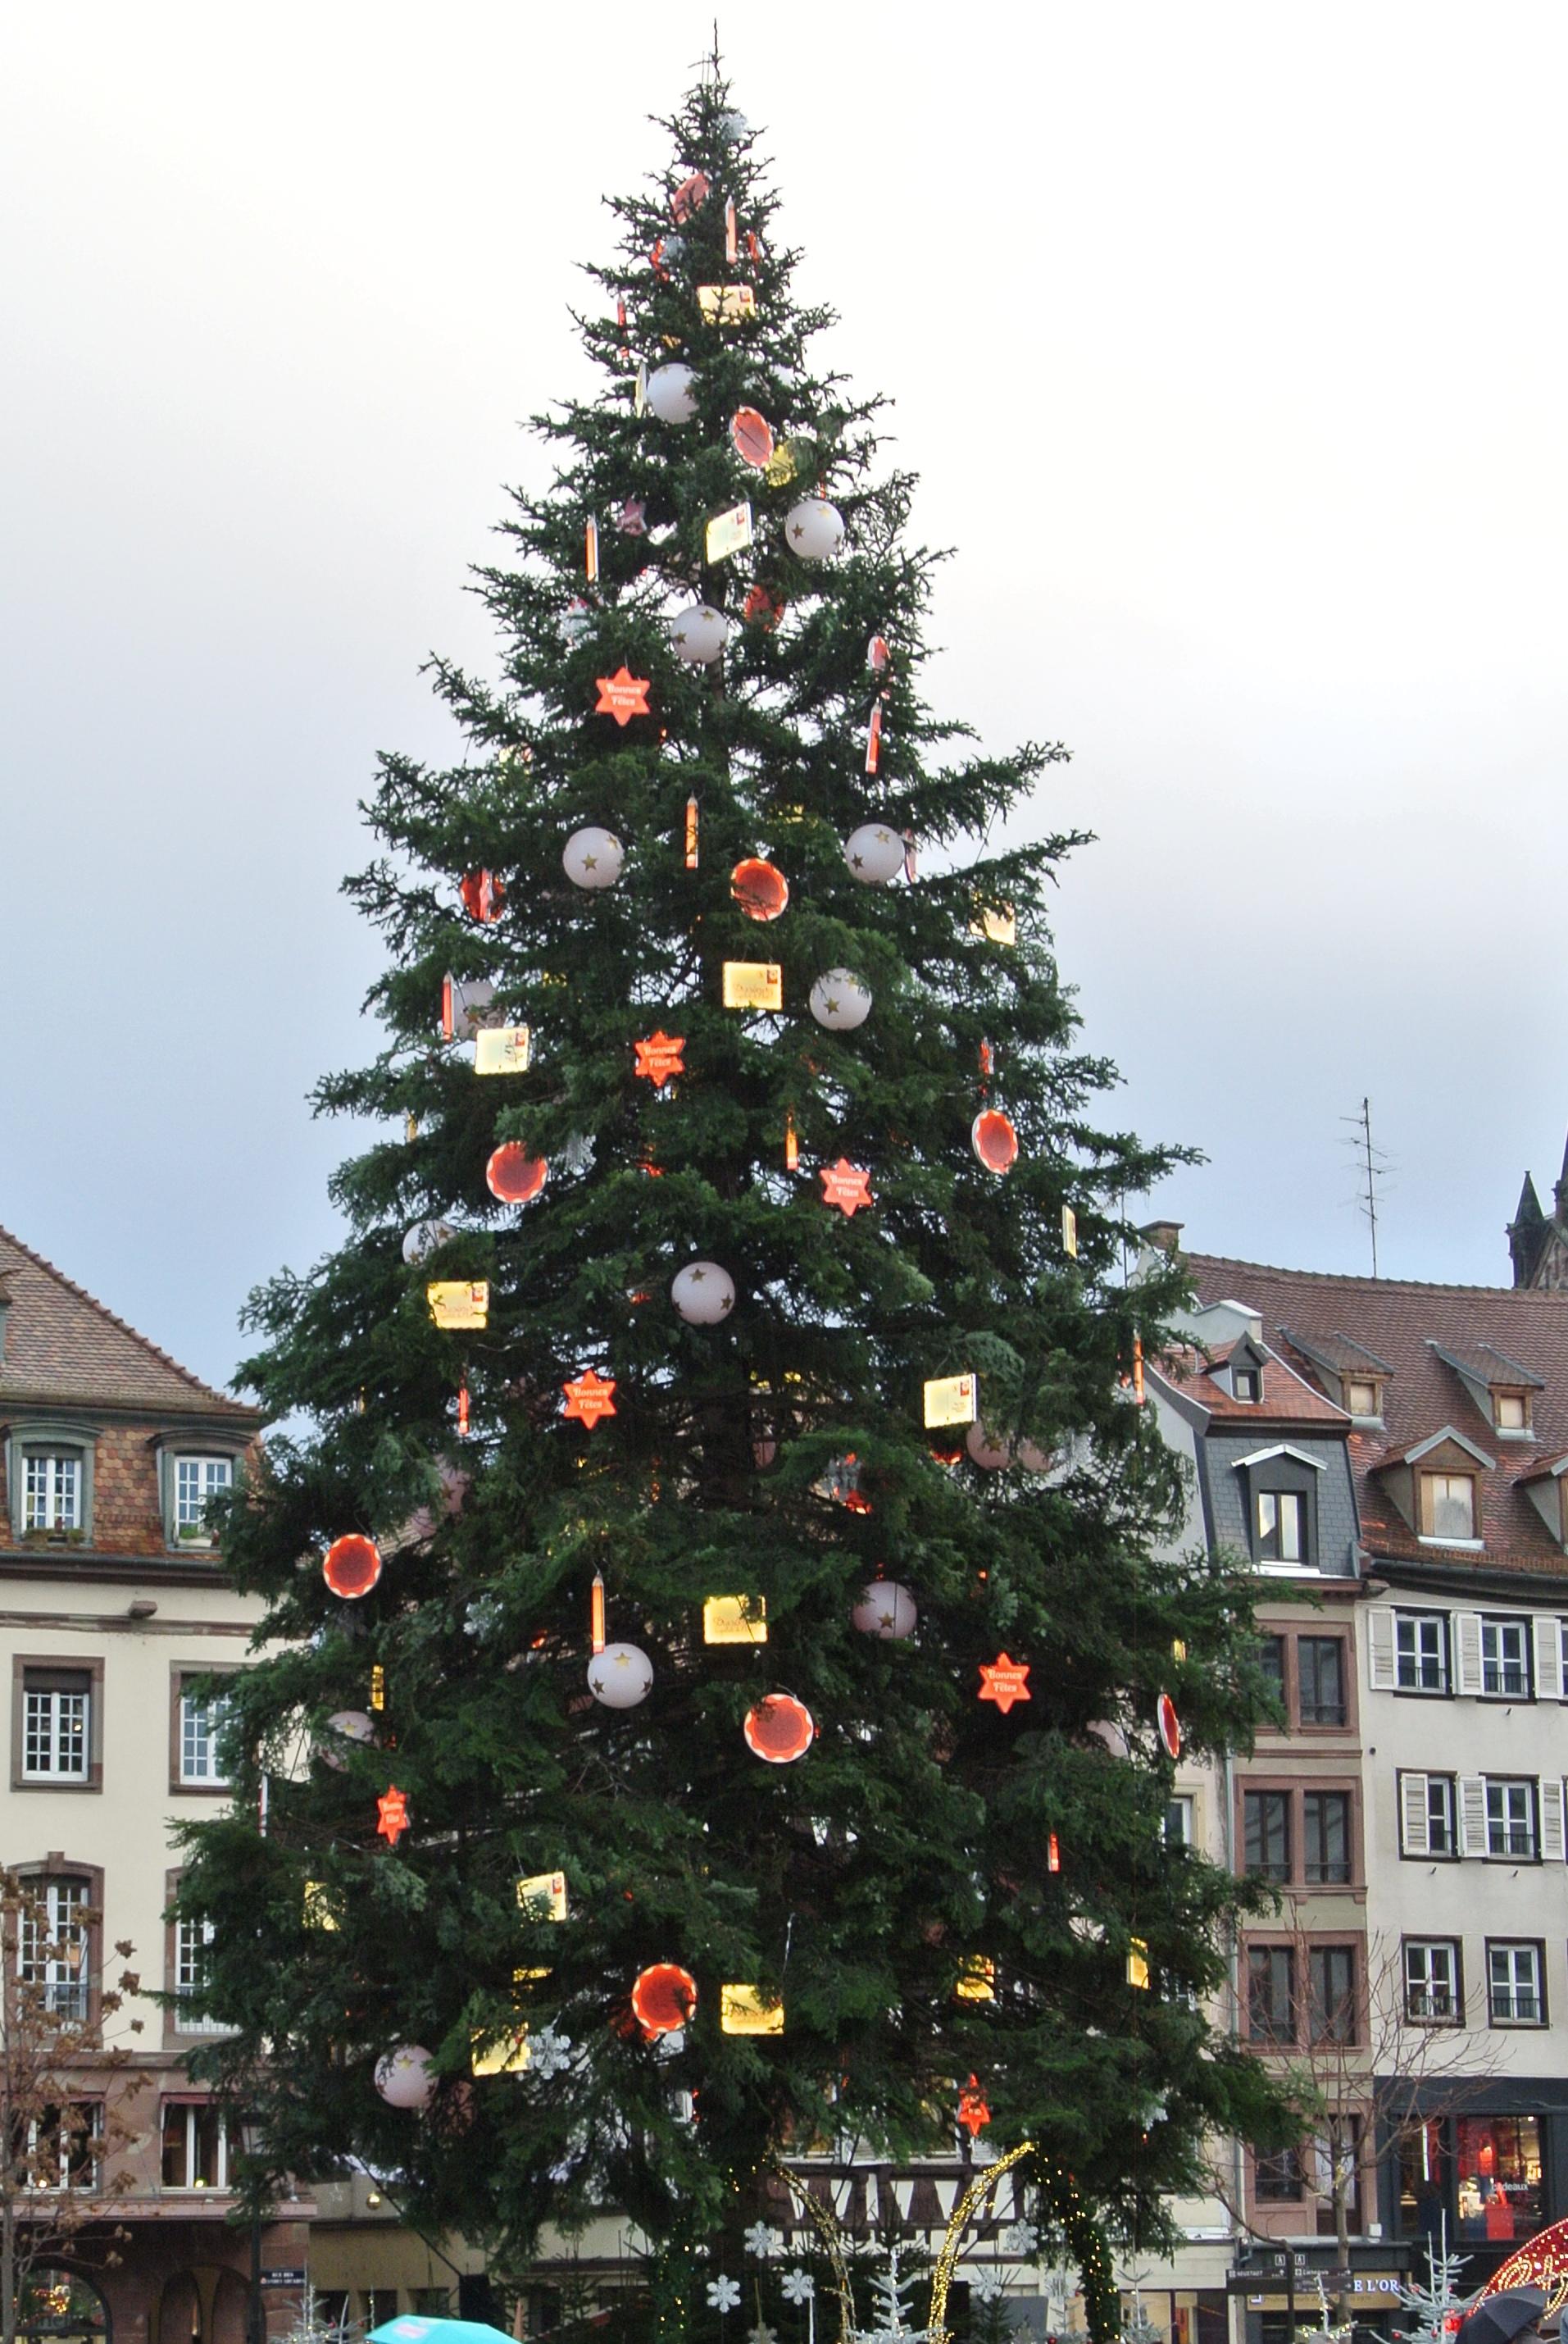 Grand Sapin De Noel File:Place Kléber   Le grand sapin de Noël.   Wikimedia Commons